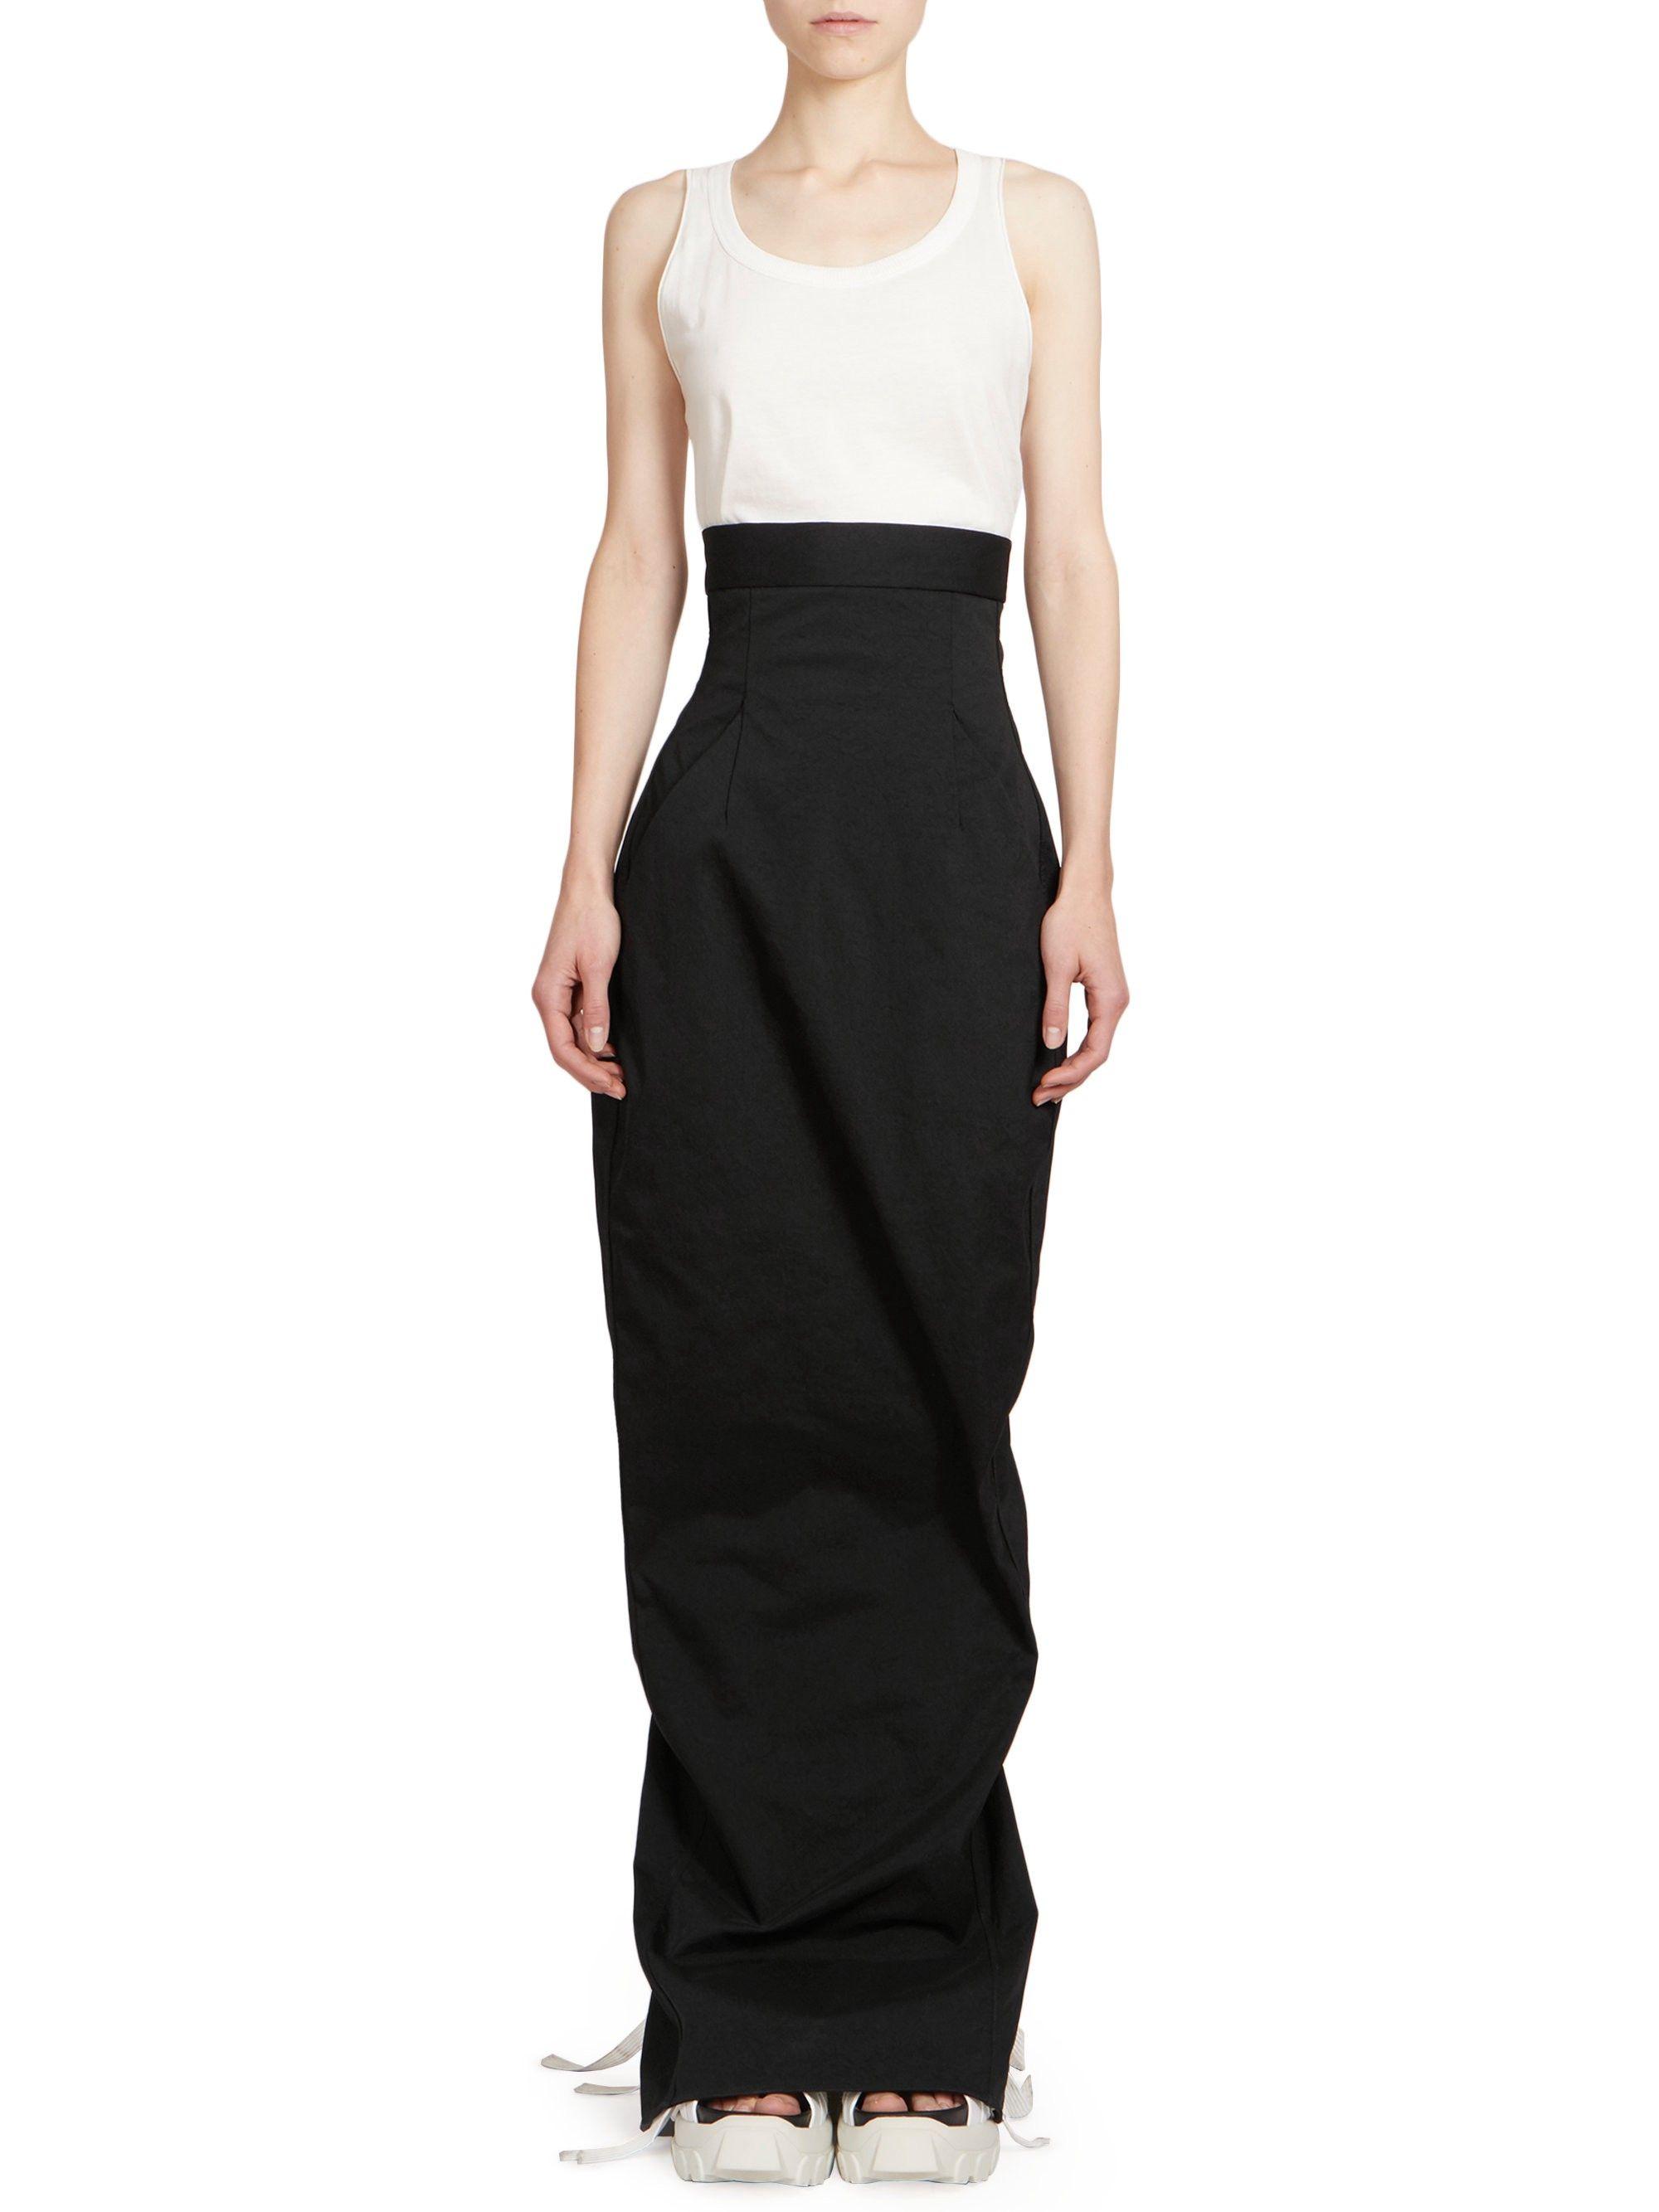 ad9ba5d5f0 Dirt Pillar High Waist Maxi Skirt by Rick Owens | Products | Maxi ...